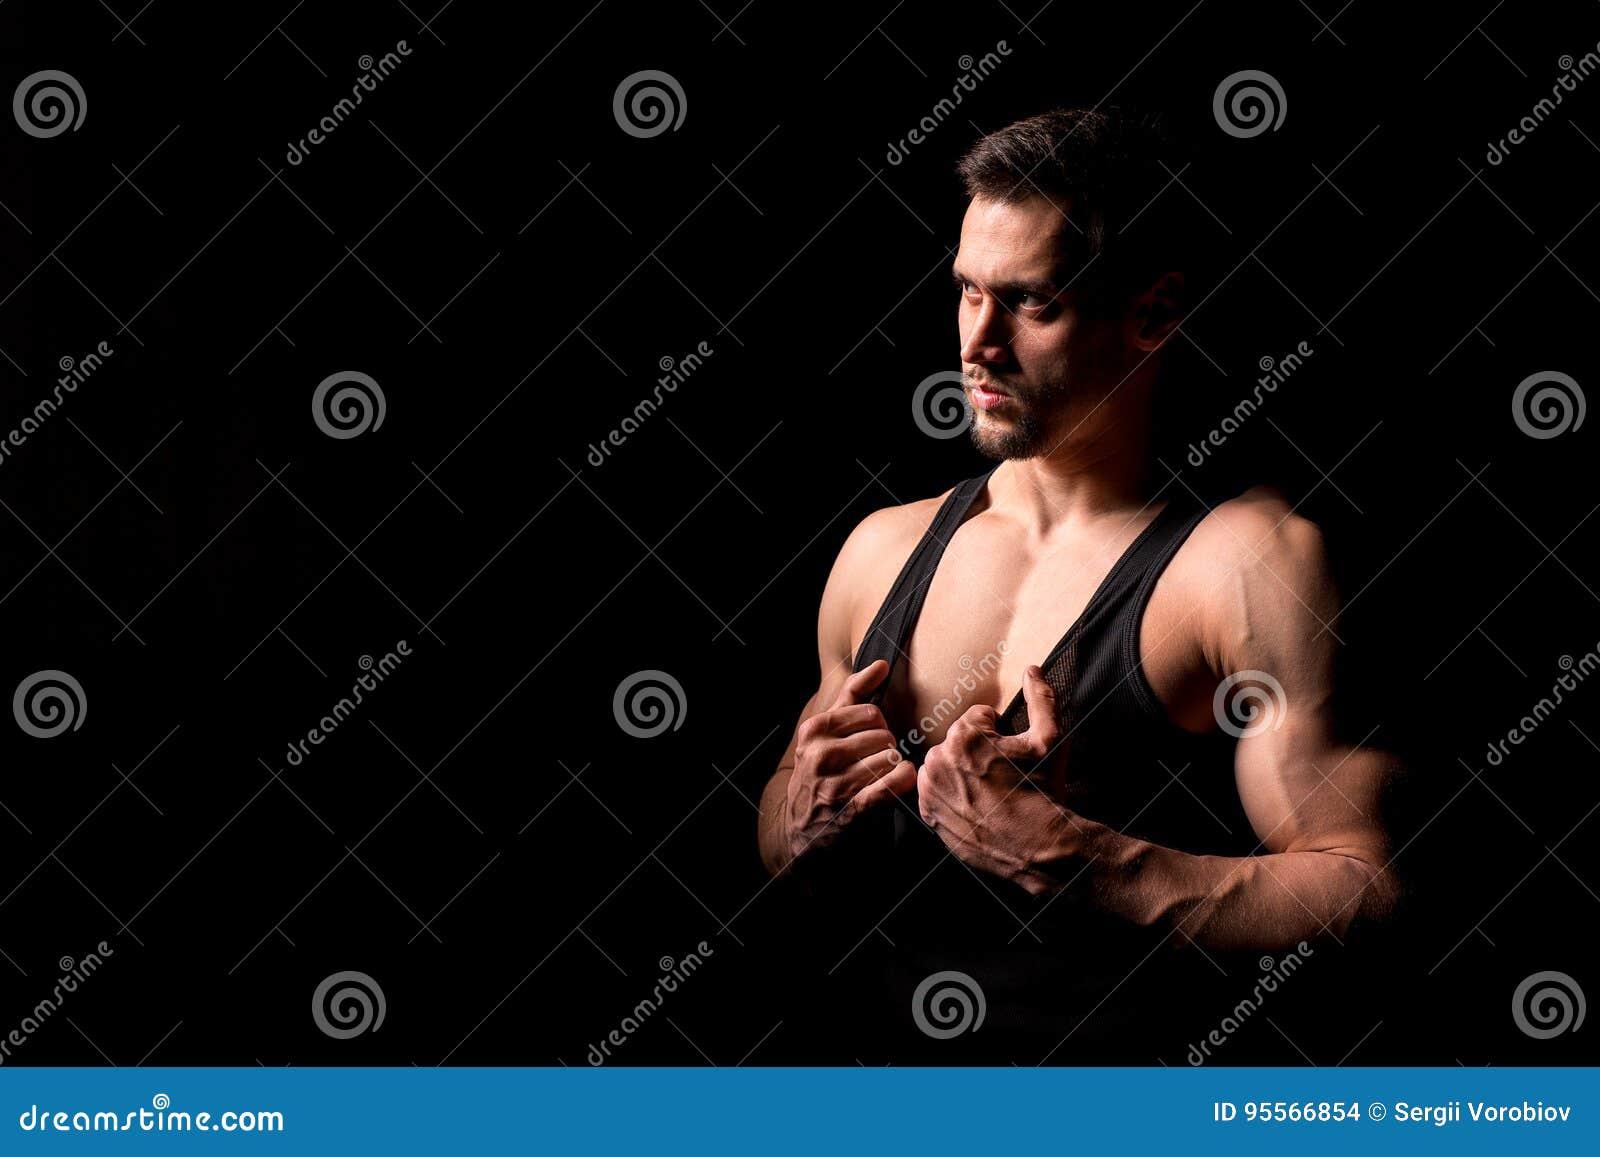 Sexy body stripping